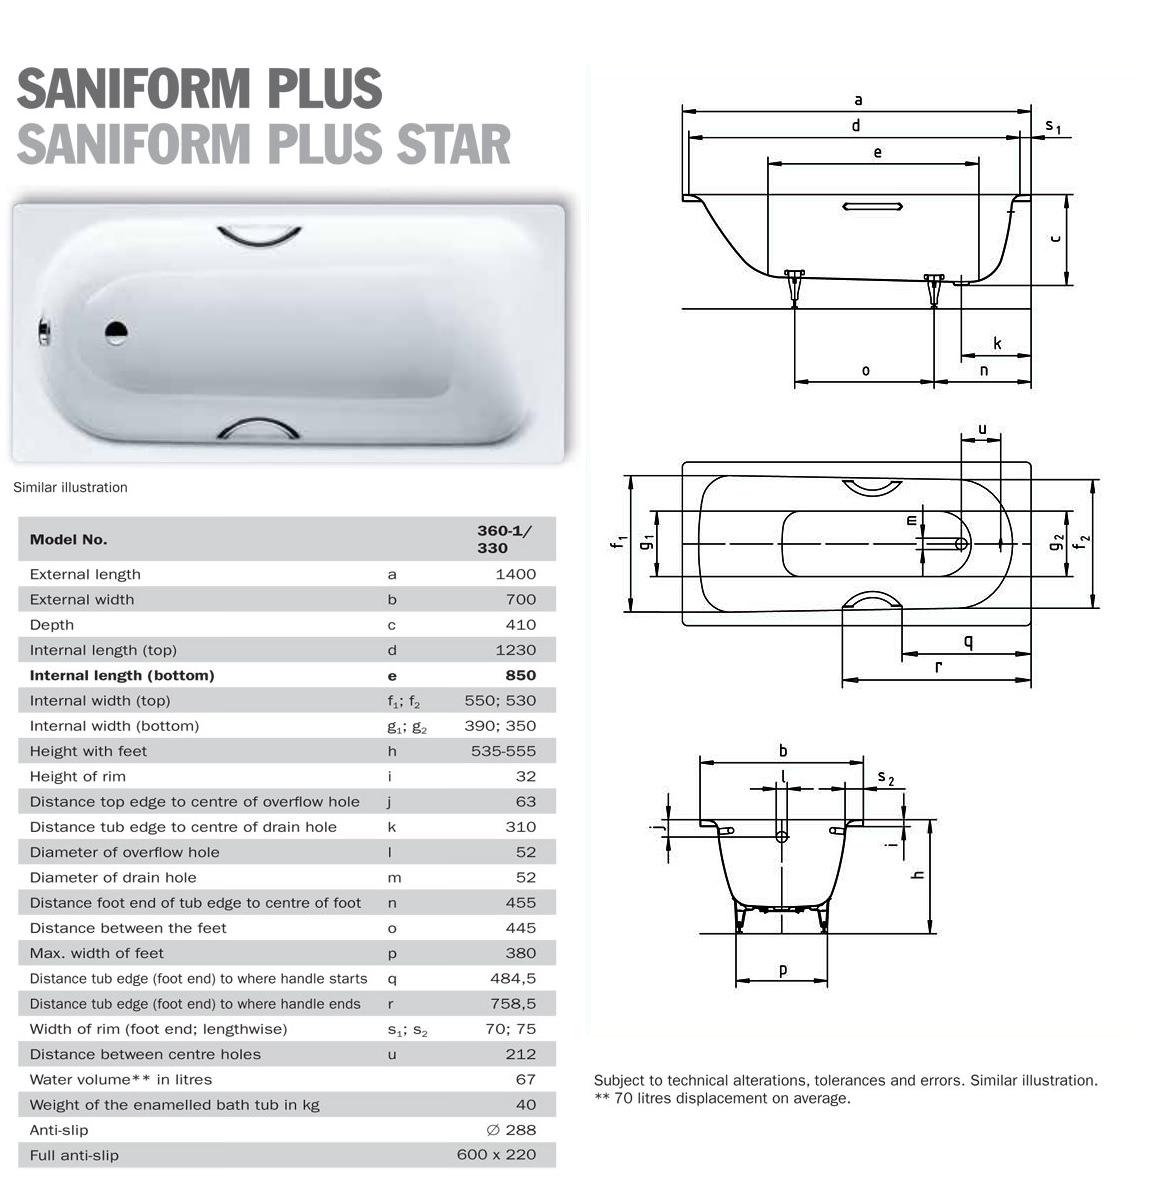 kaldewei saniform plus 360 1 steel bath 1400 x 700mm. Black Bedroom Furniture Sets. Home Design Ideas